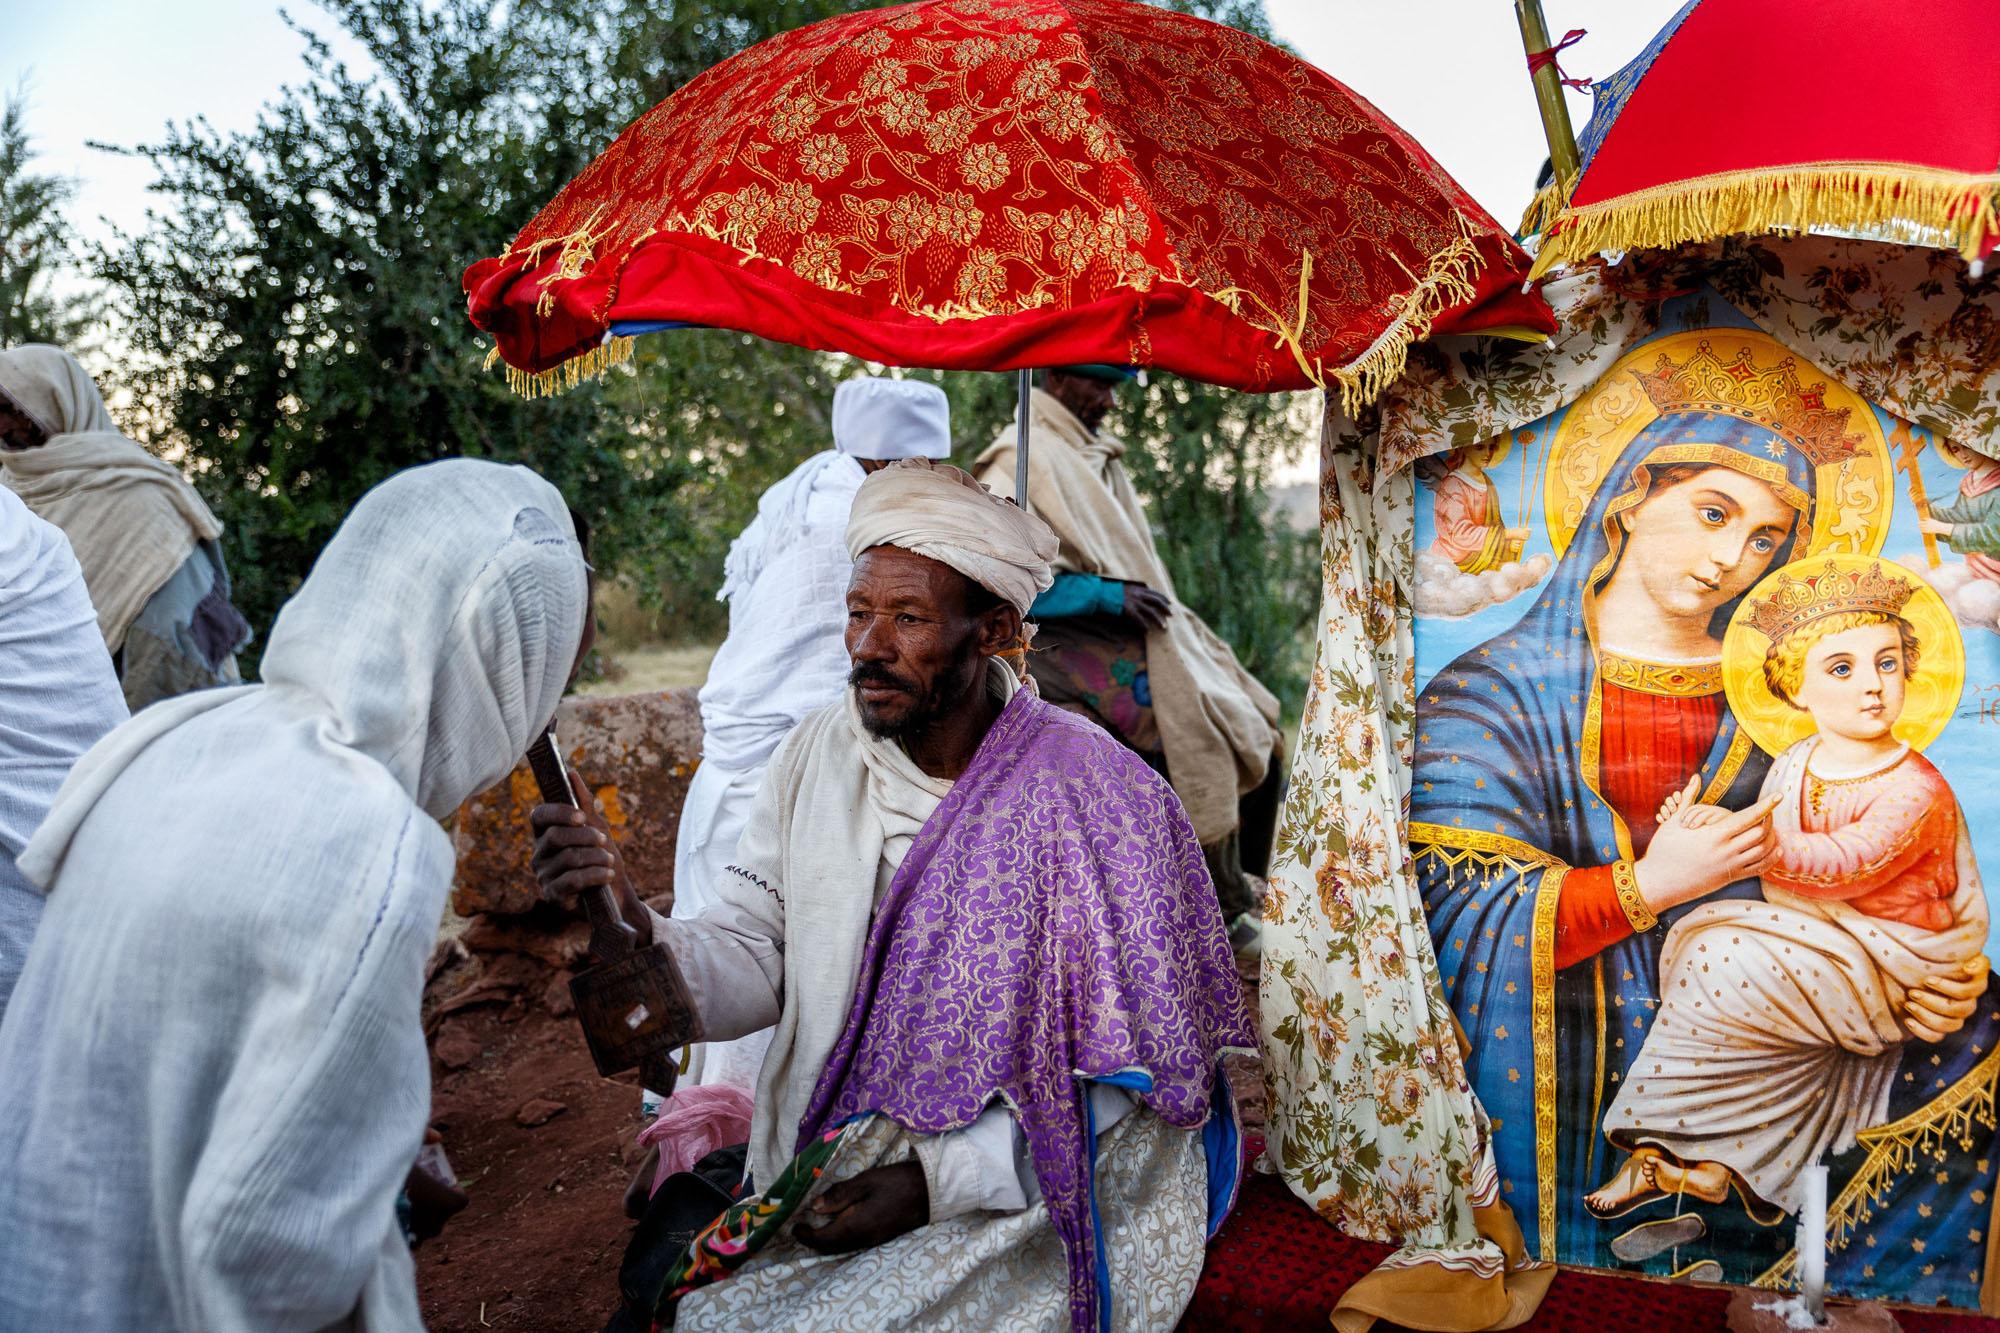 mario adario - When Is Ethiopian Christmas